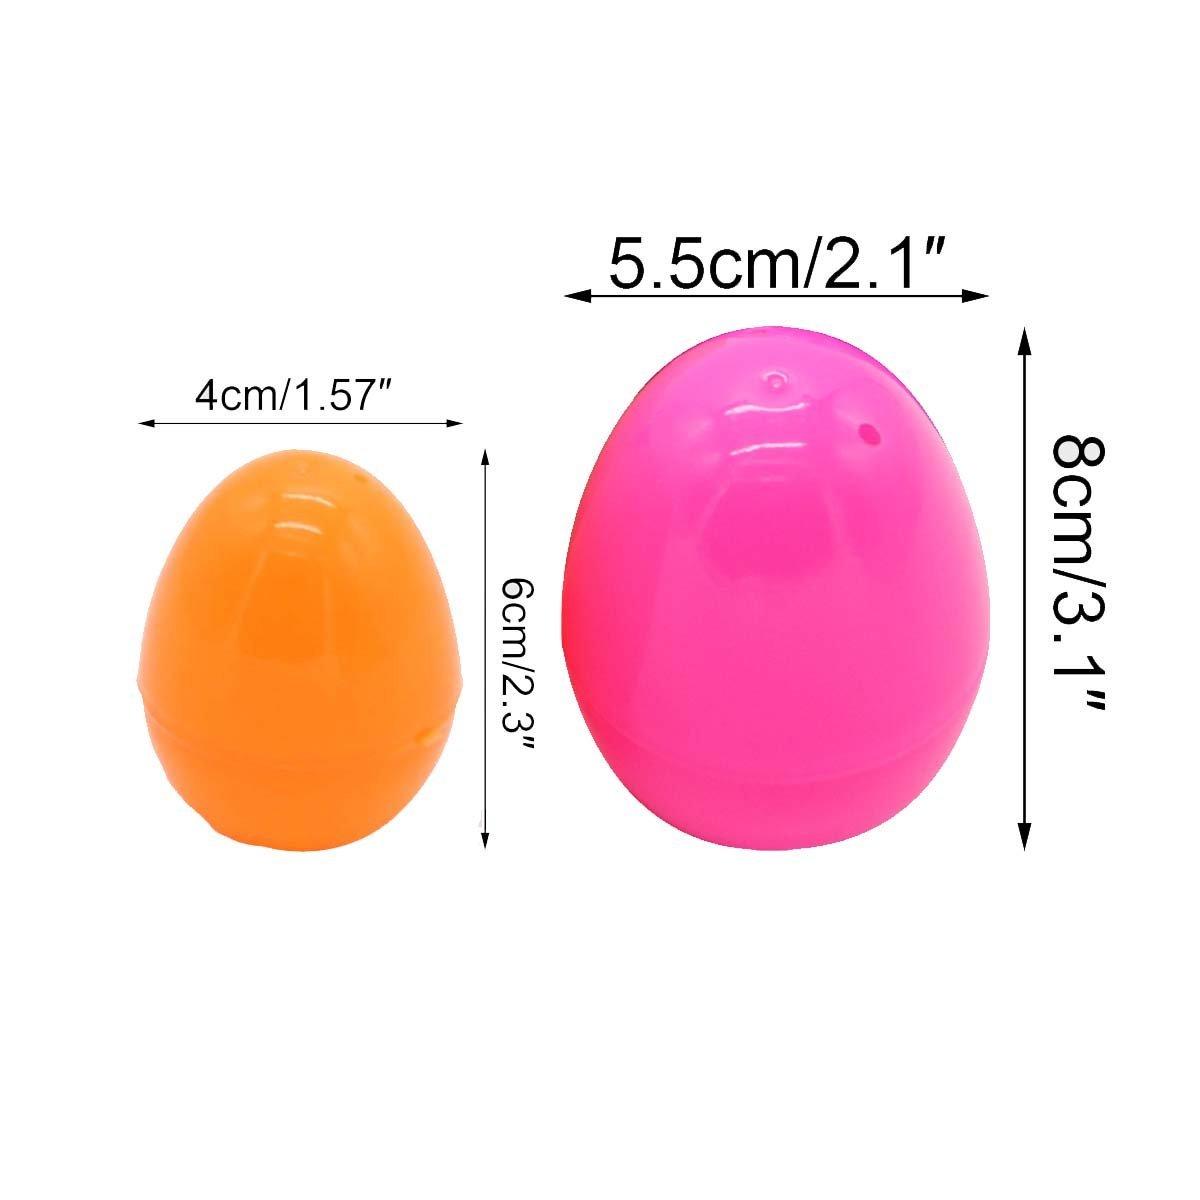 Mochiglory Large Size Assorted Colors 12pcs Easter Eggs DIY Decoration